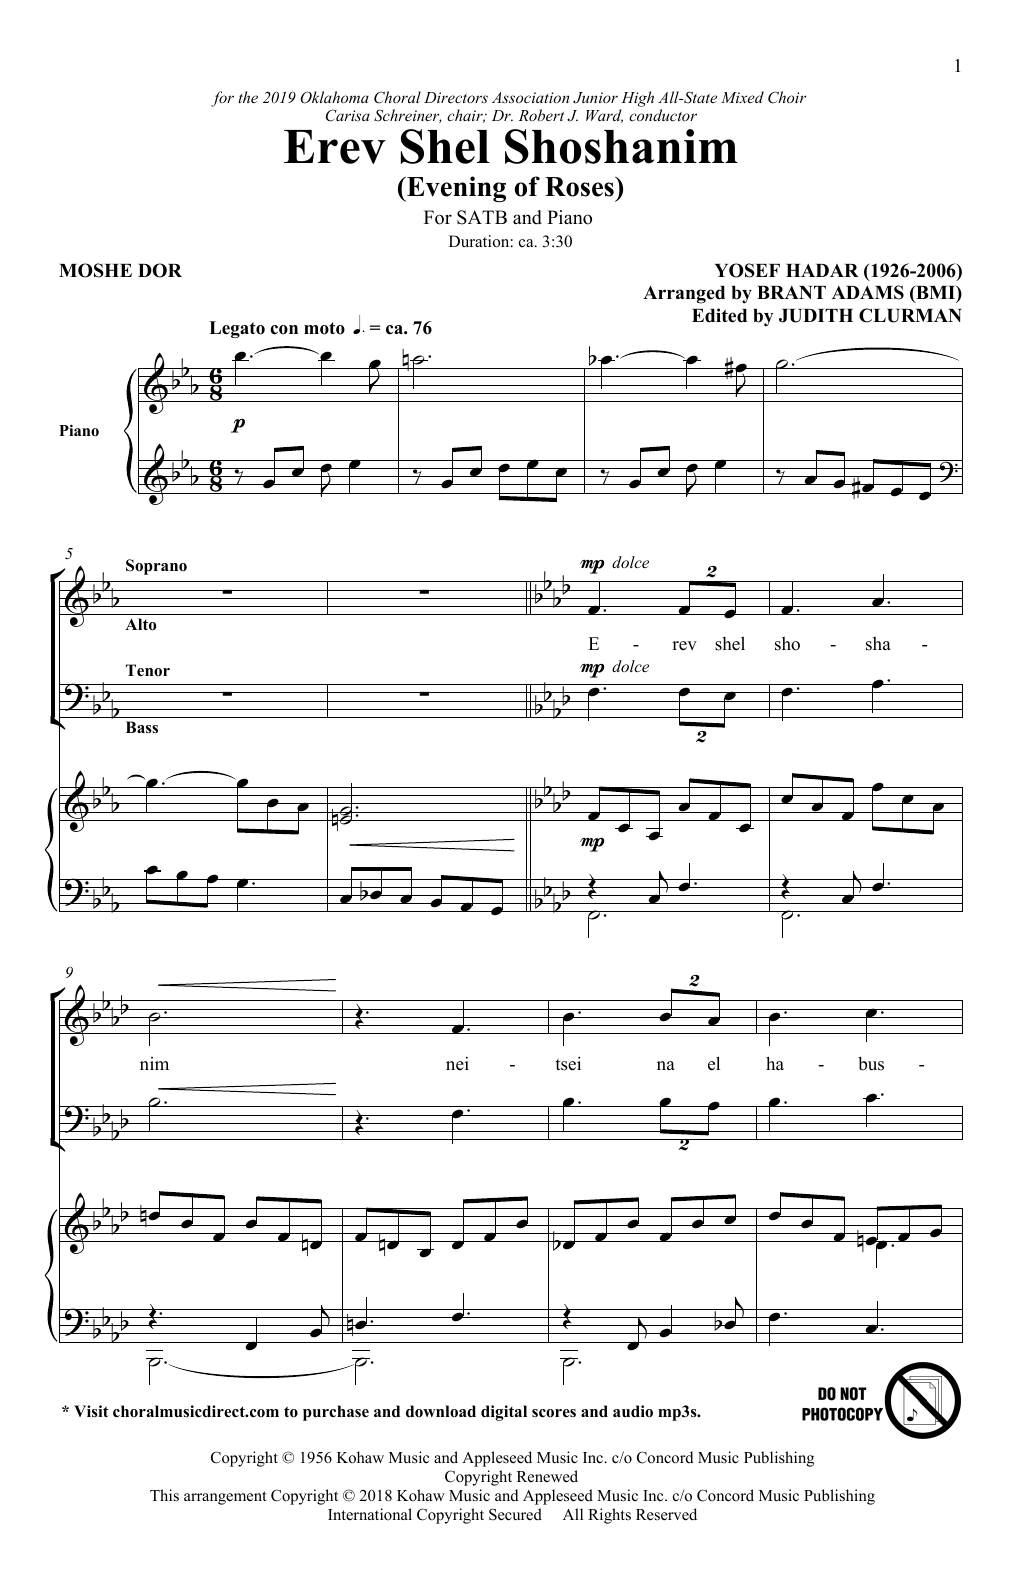 Erev Shel Shoshanim (arr. Brant Adams) (SATB Choir)